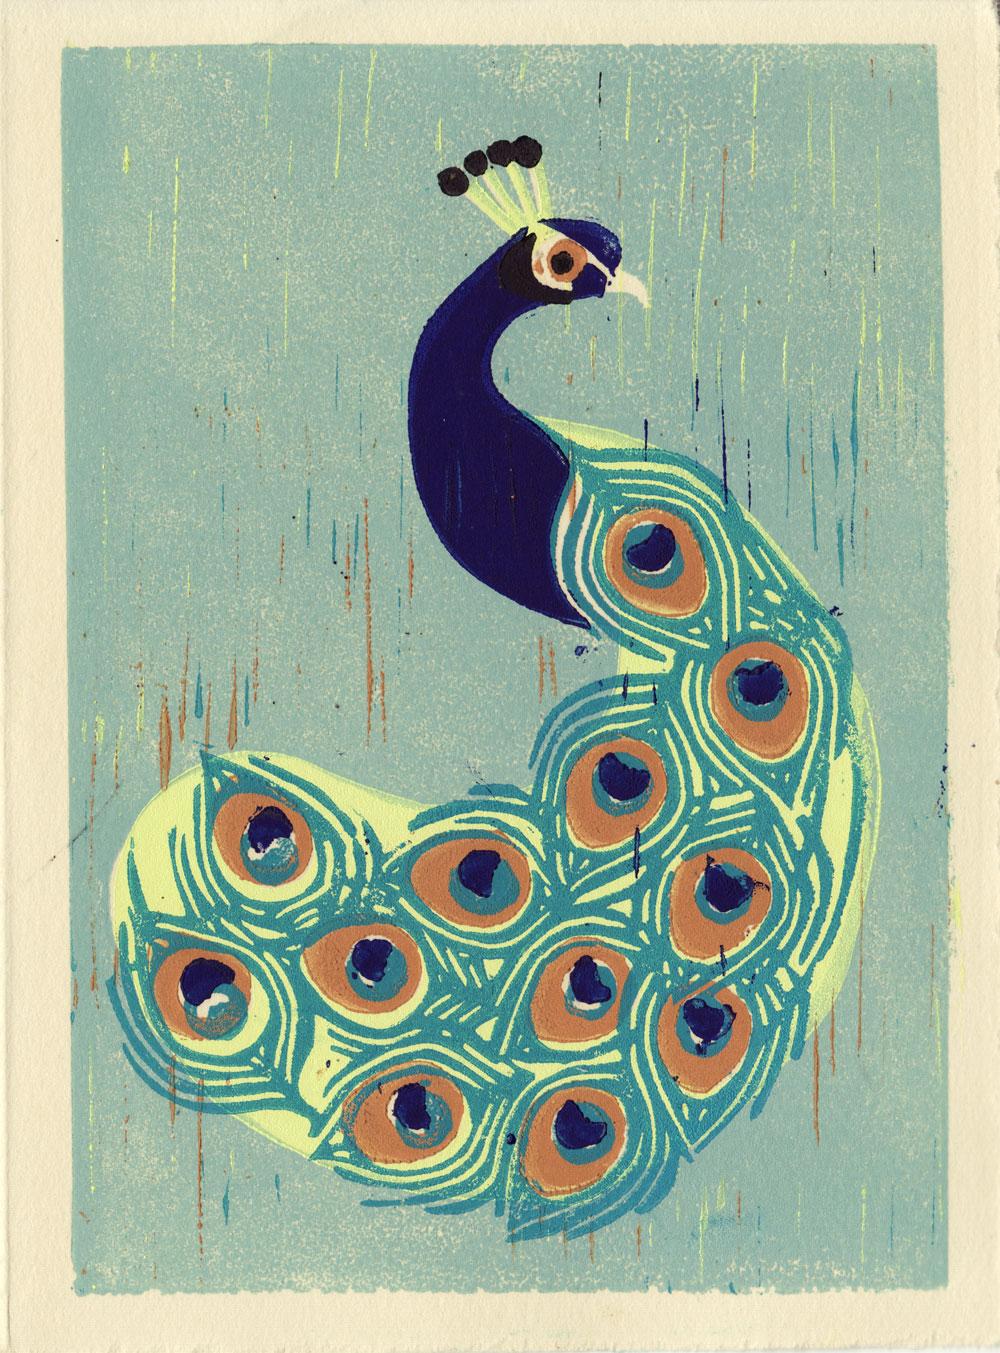 Indian Peacock Hand Pulled Linocut Illustration Art Print